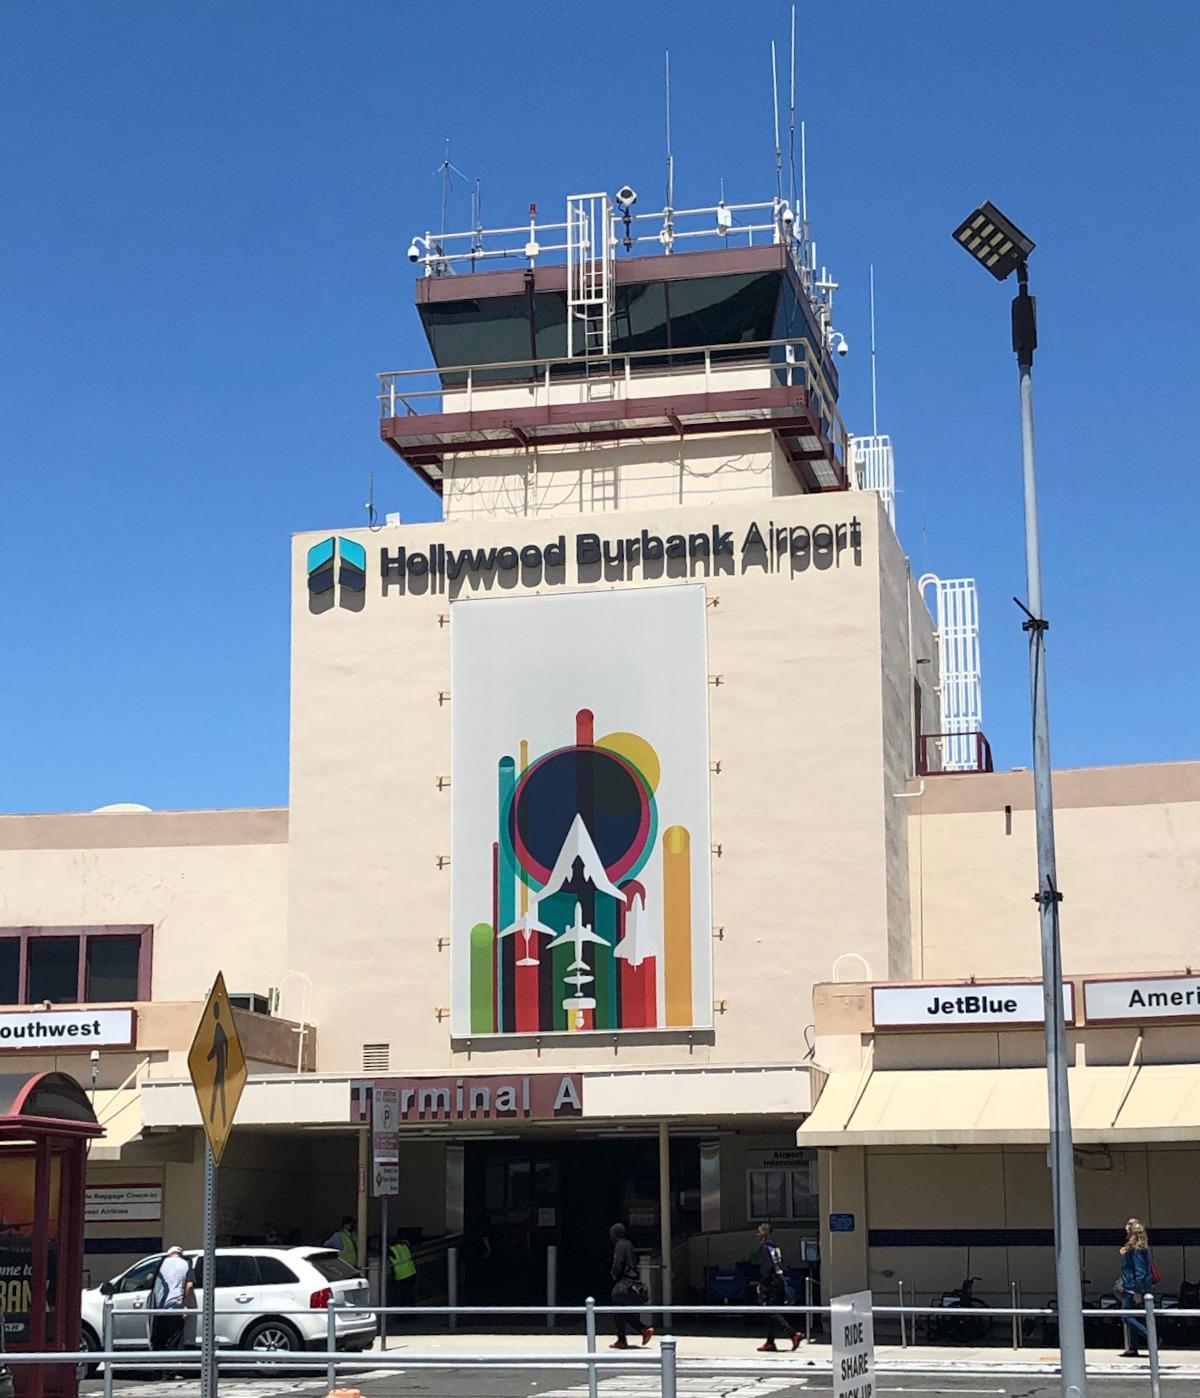 Burbank Hollywood Airport